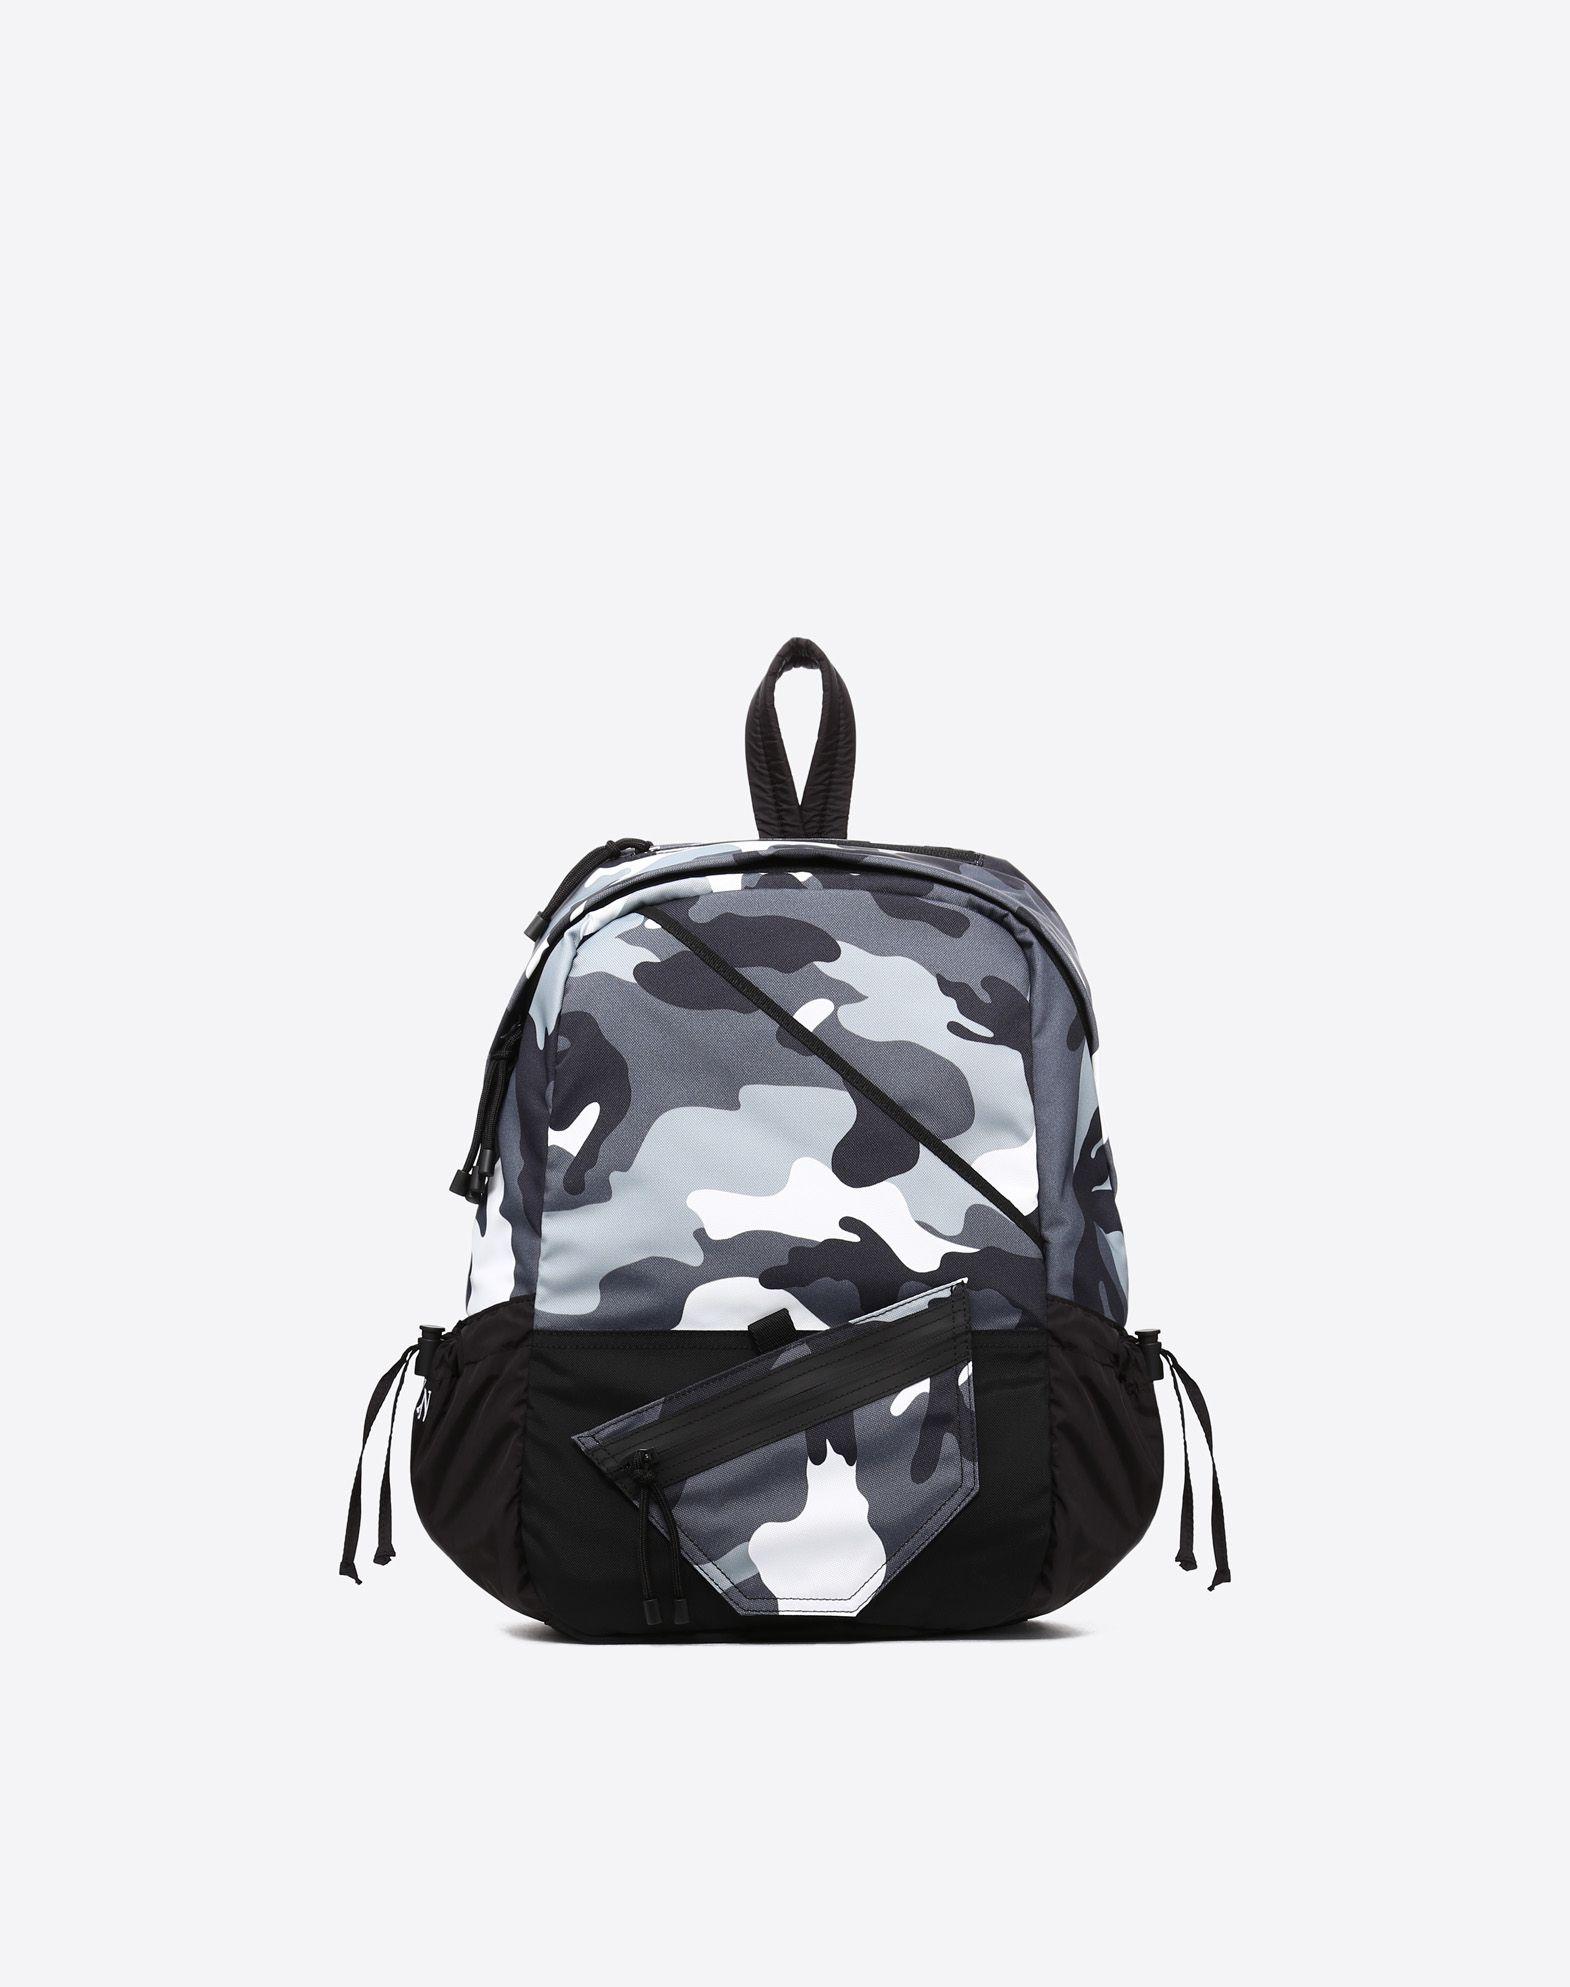 VALENTINO Techno fabric Camouflage Zip External pockets Rucksacks & Bumbags Medium  45411125xl